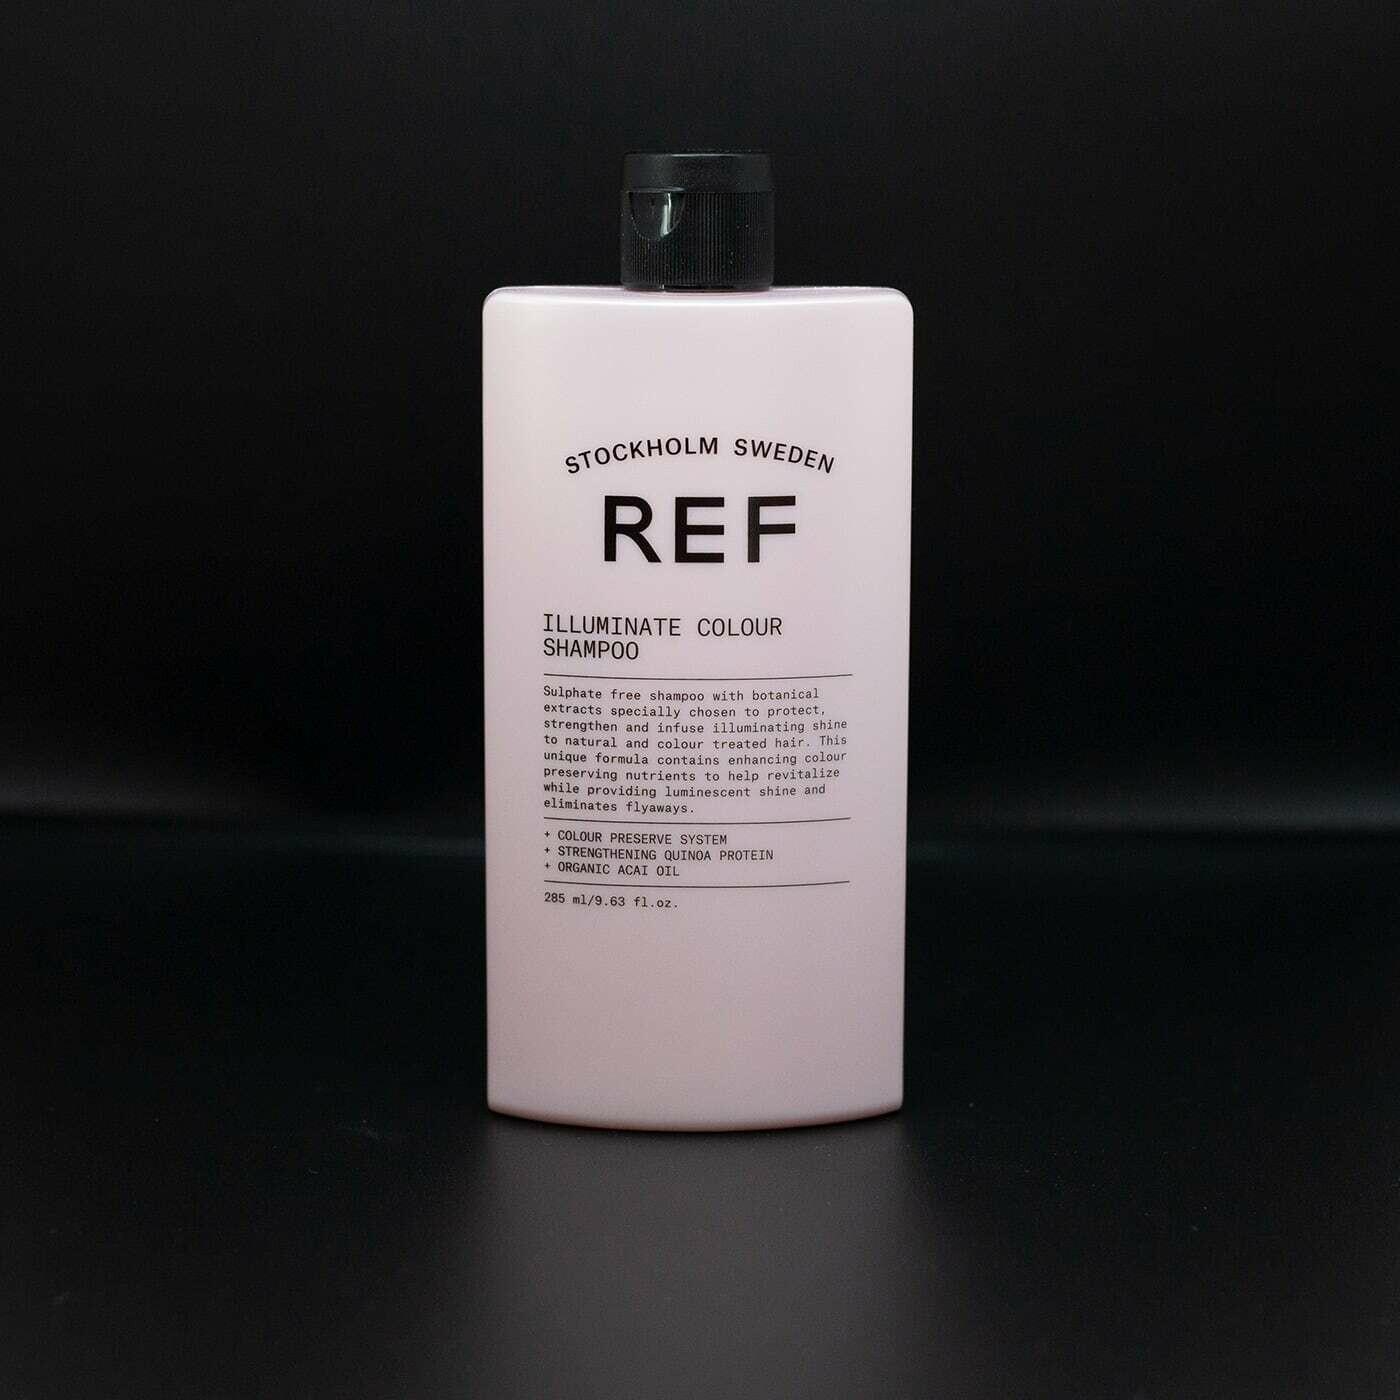 REF Illuminate Colour Shampoo